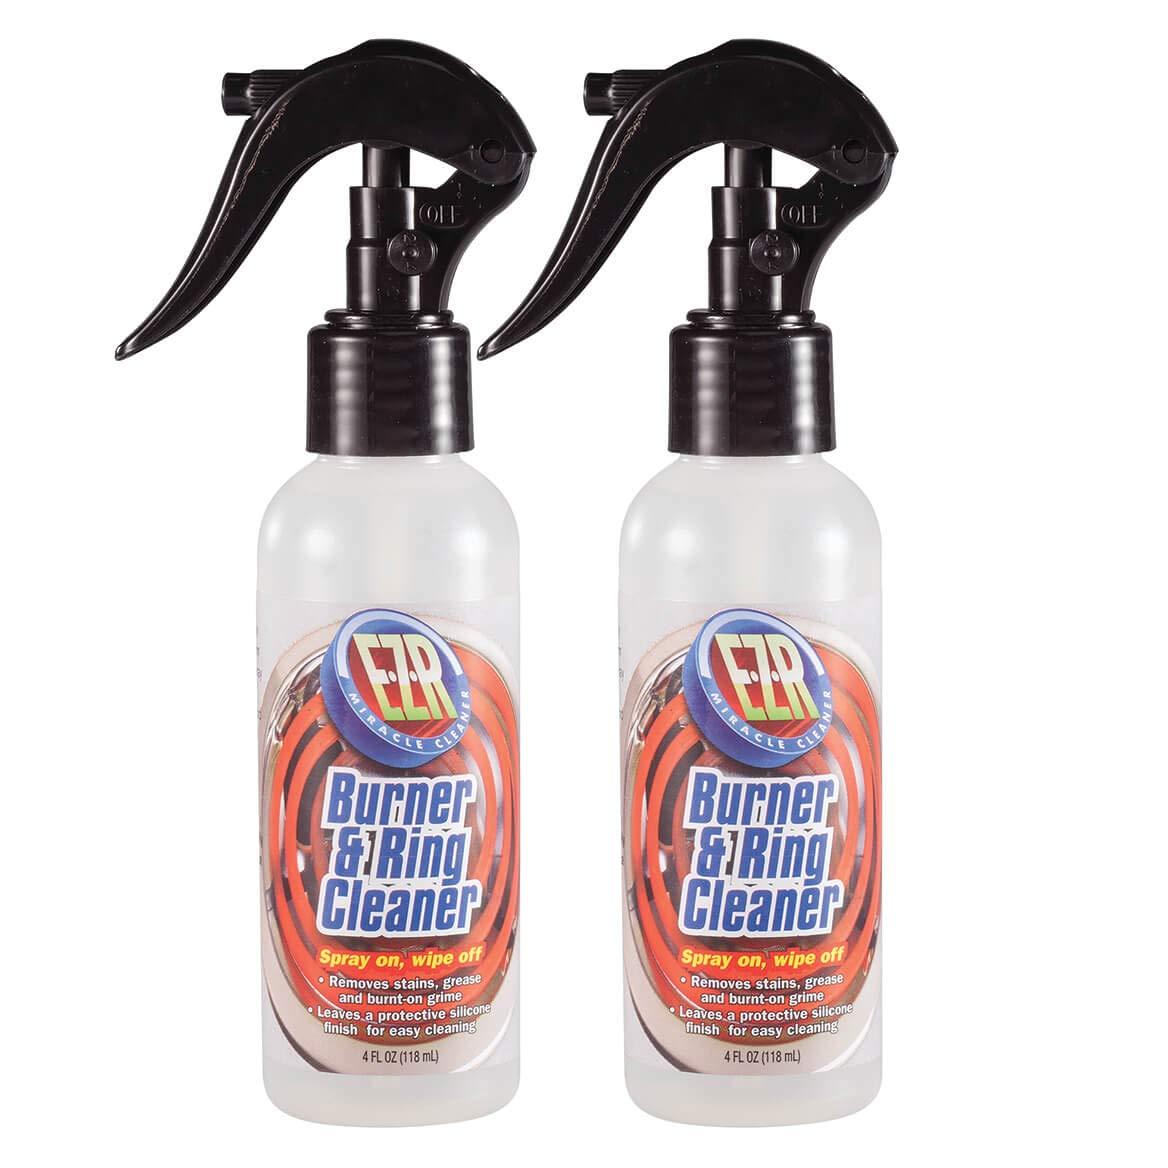 Burner & Ring Cleaner